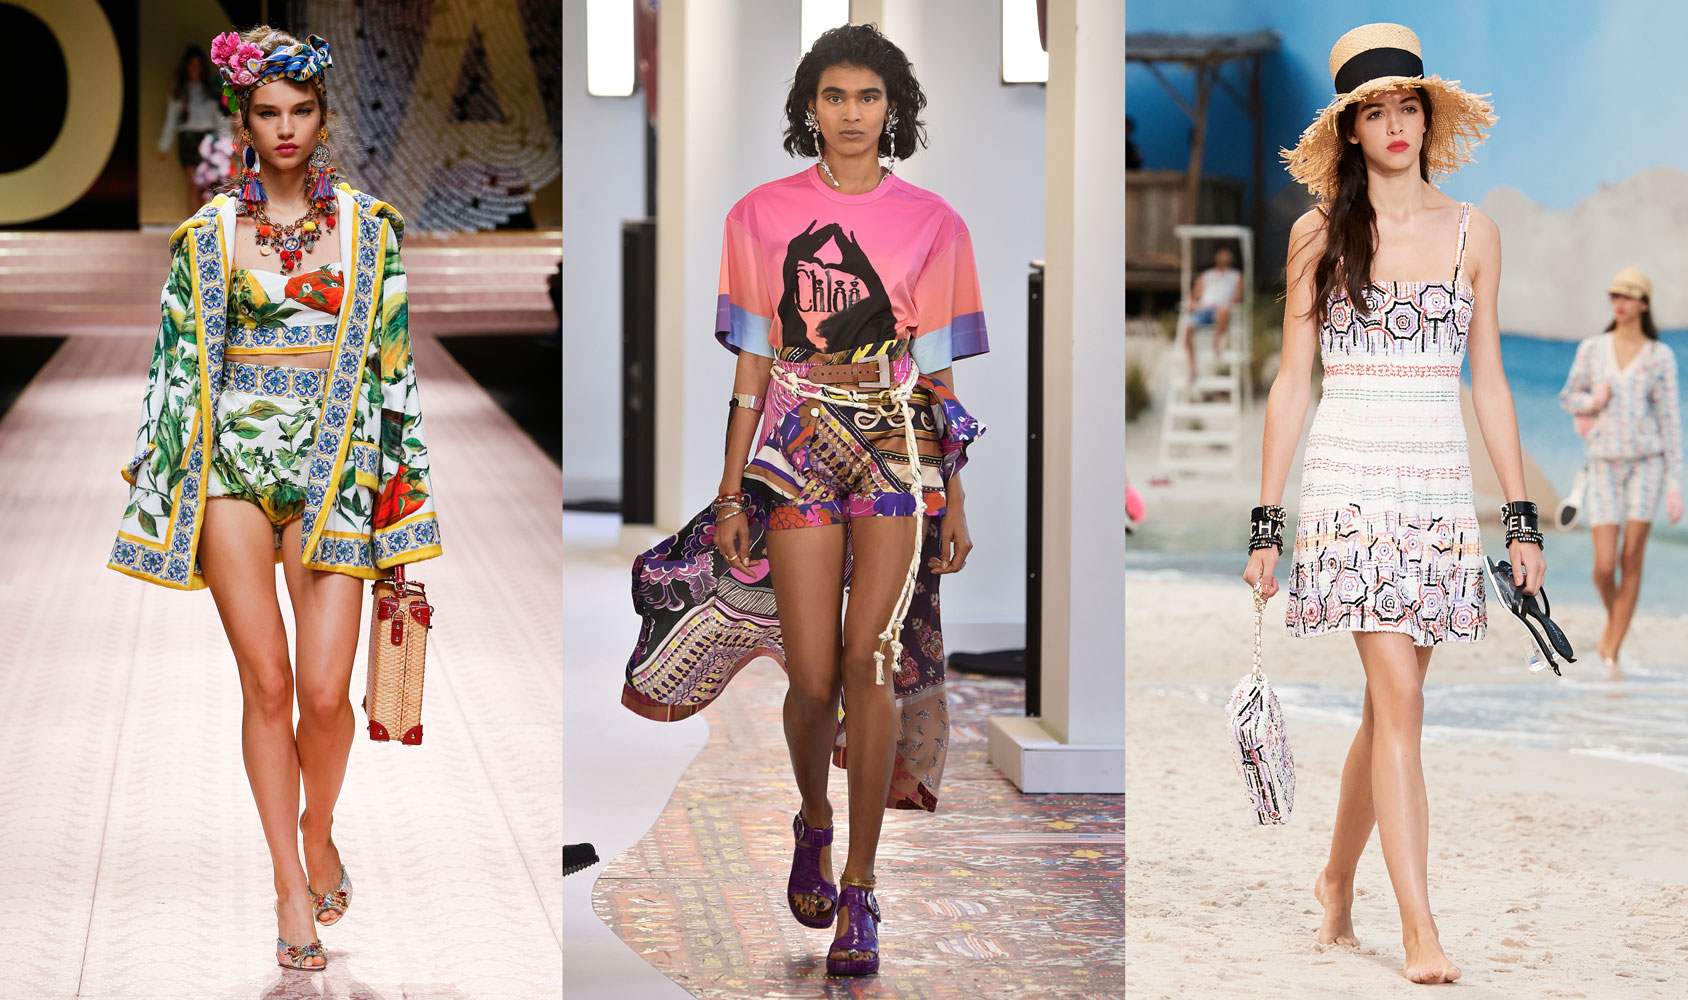 Dolce & Gabbana Spring 2019, Chloe Spring 2019, Chanel Spring 2019